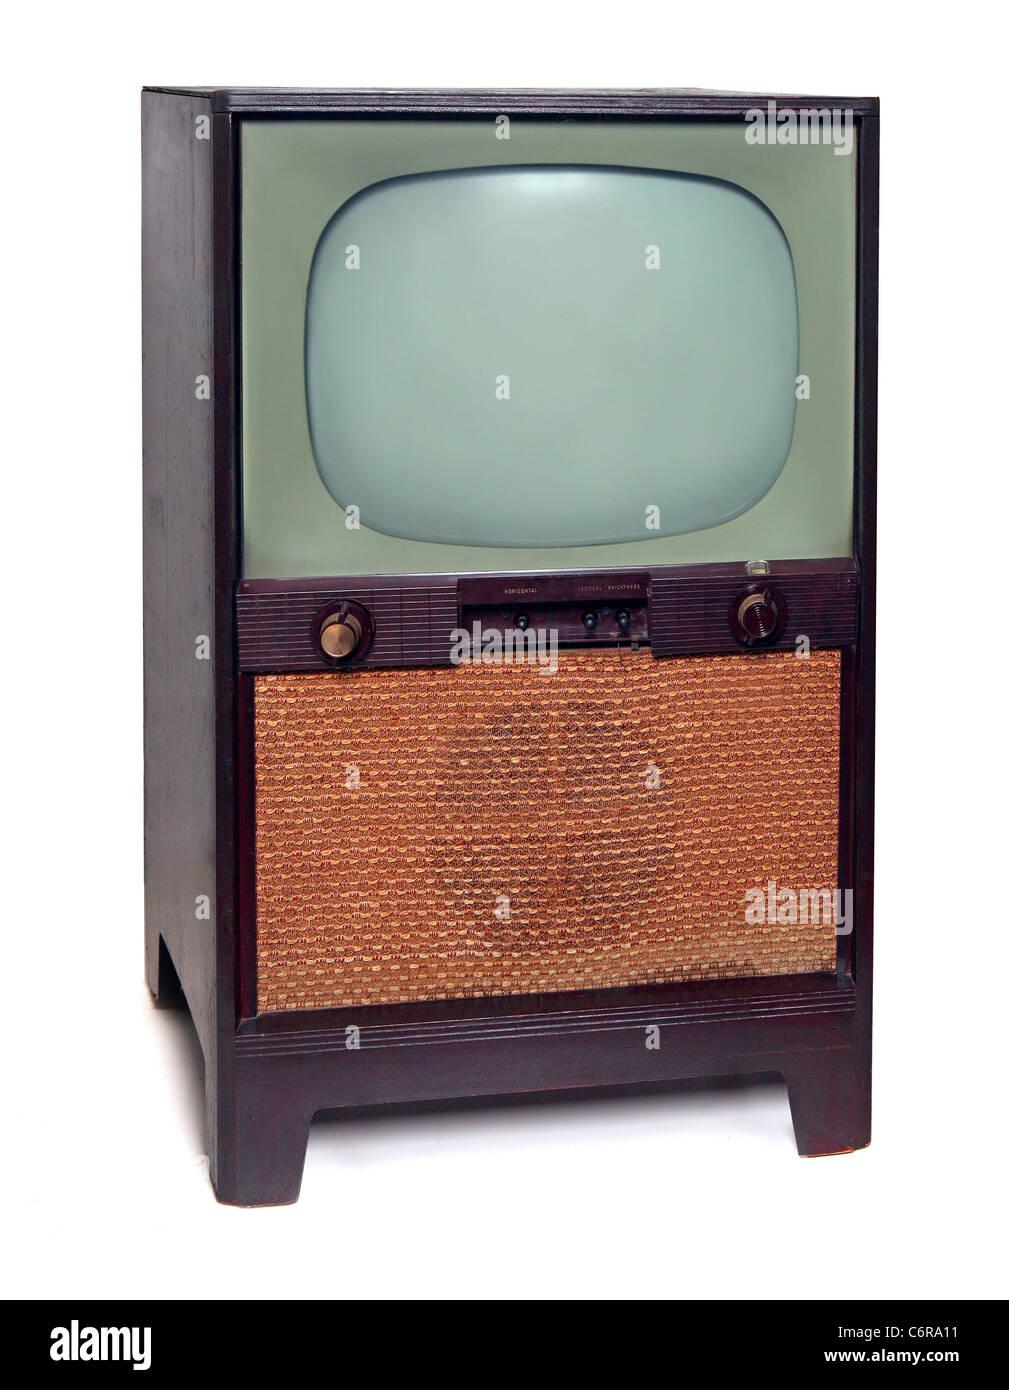 Jahrgang 1950-TV Fernsehen, Isolated on White Background Stockbild